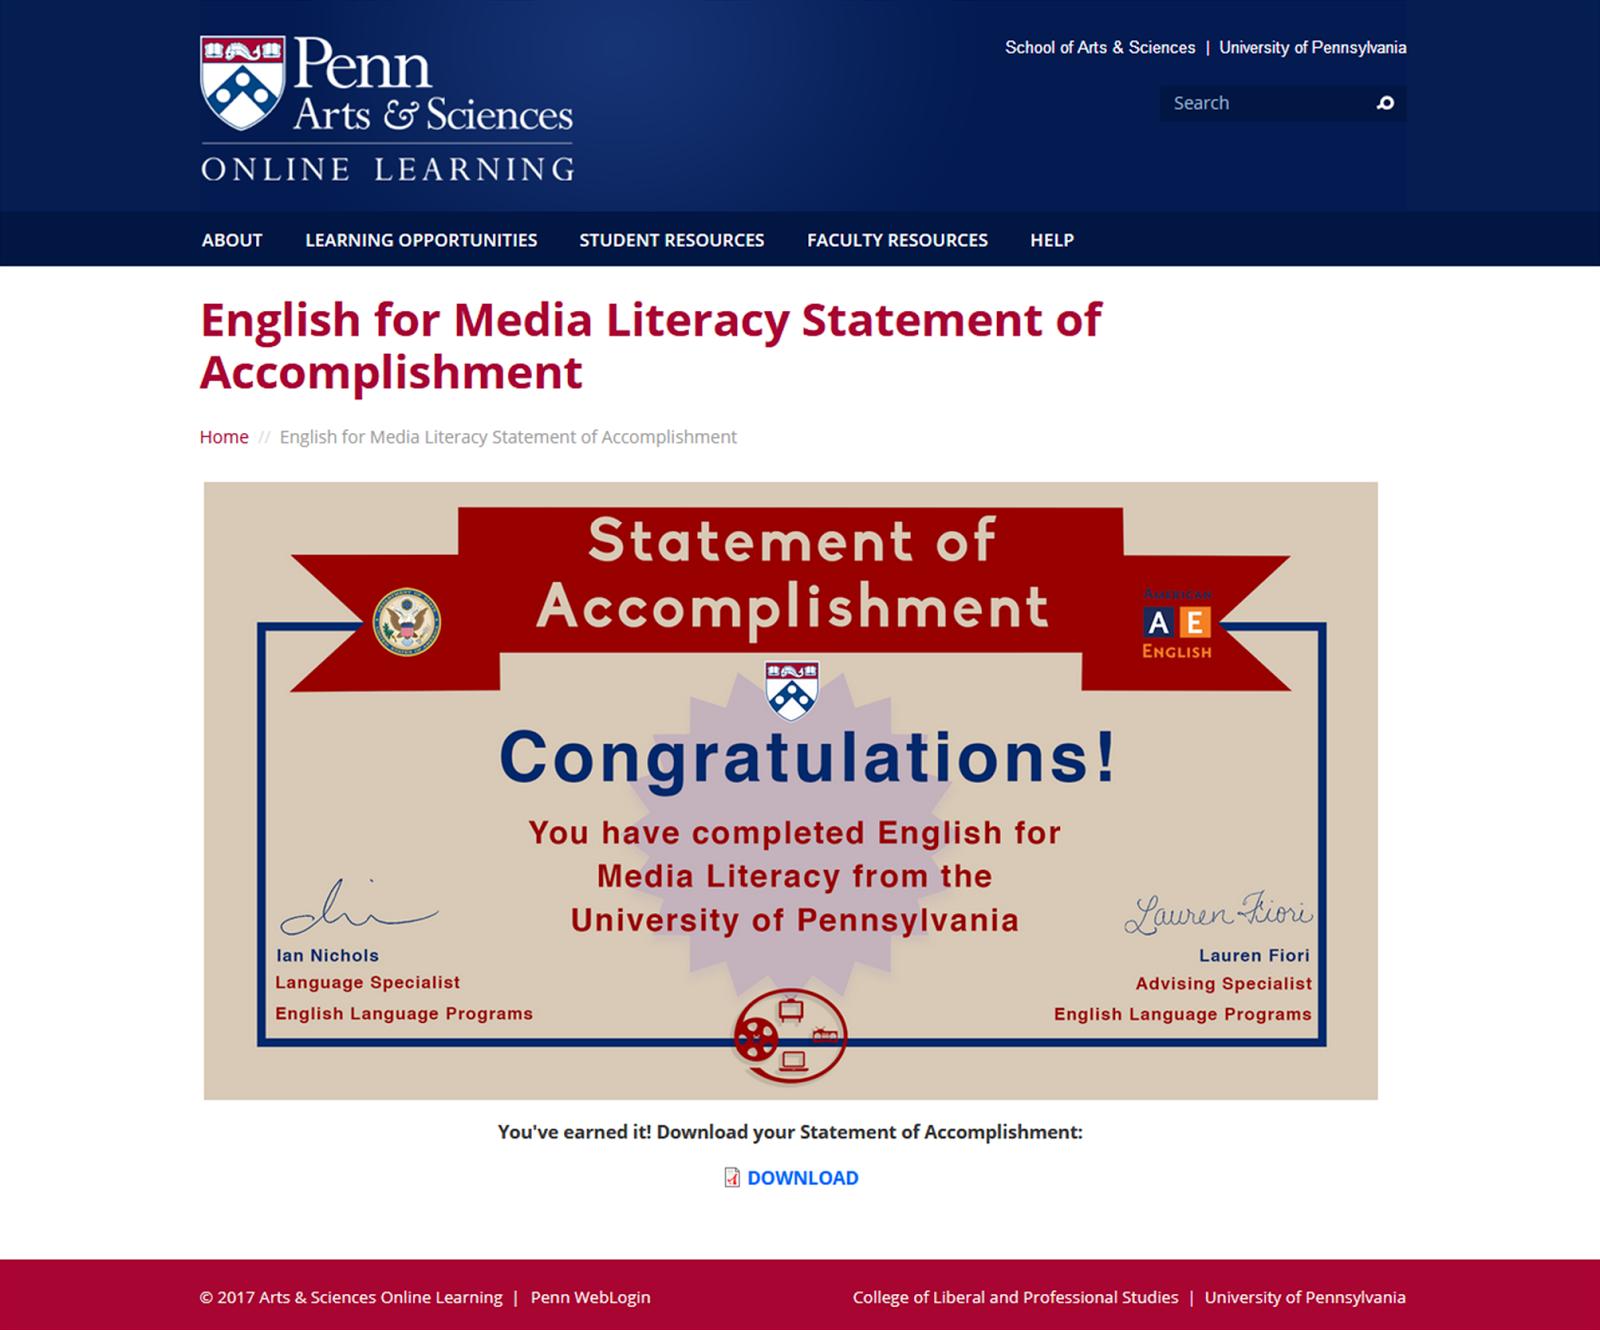 English for Media Literacy Statement of Accomplishment